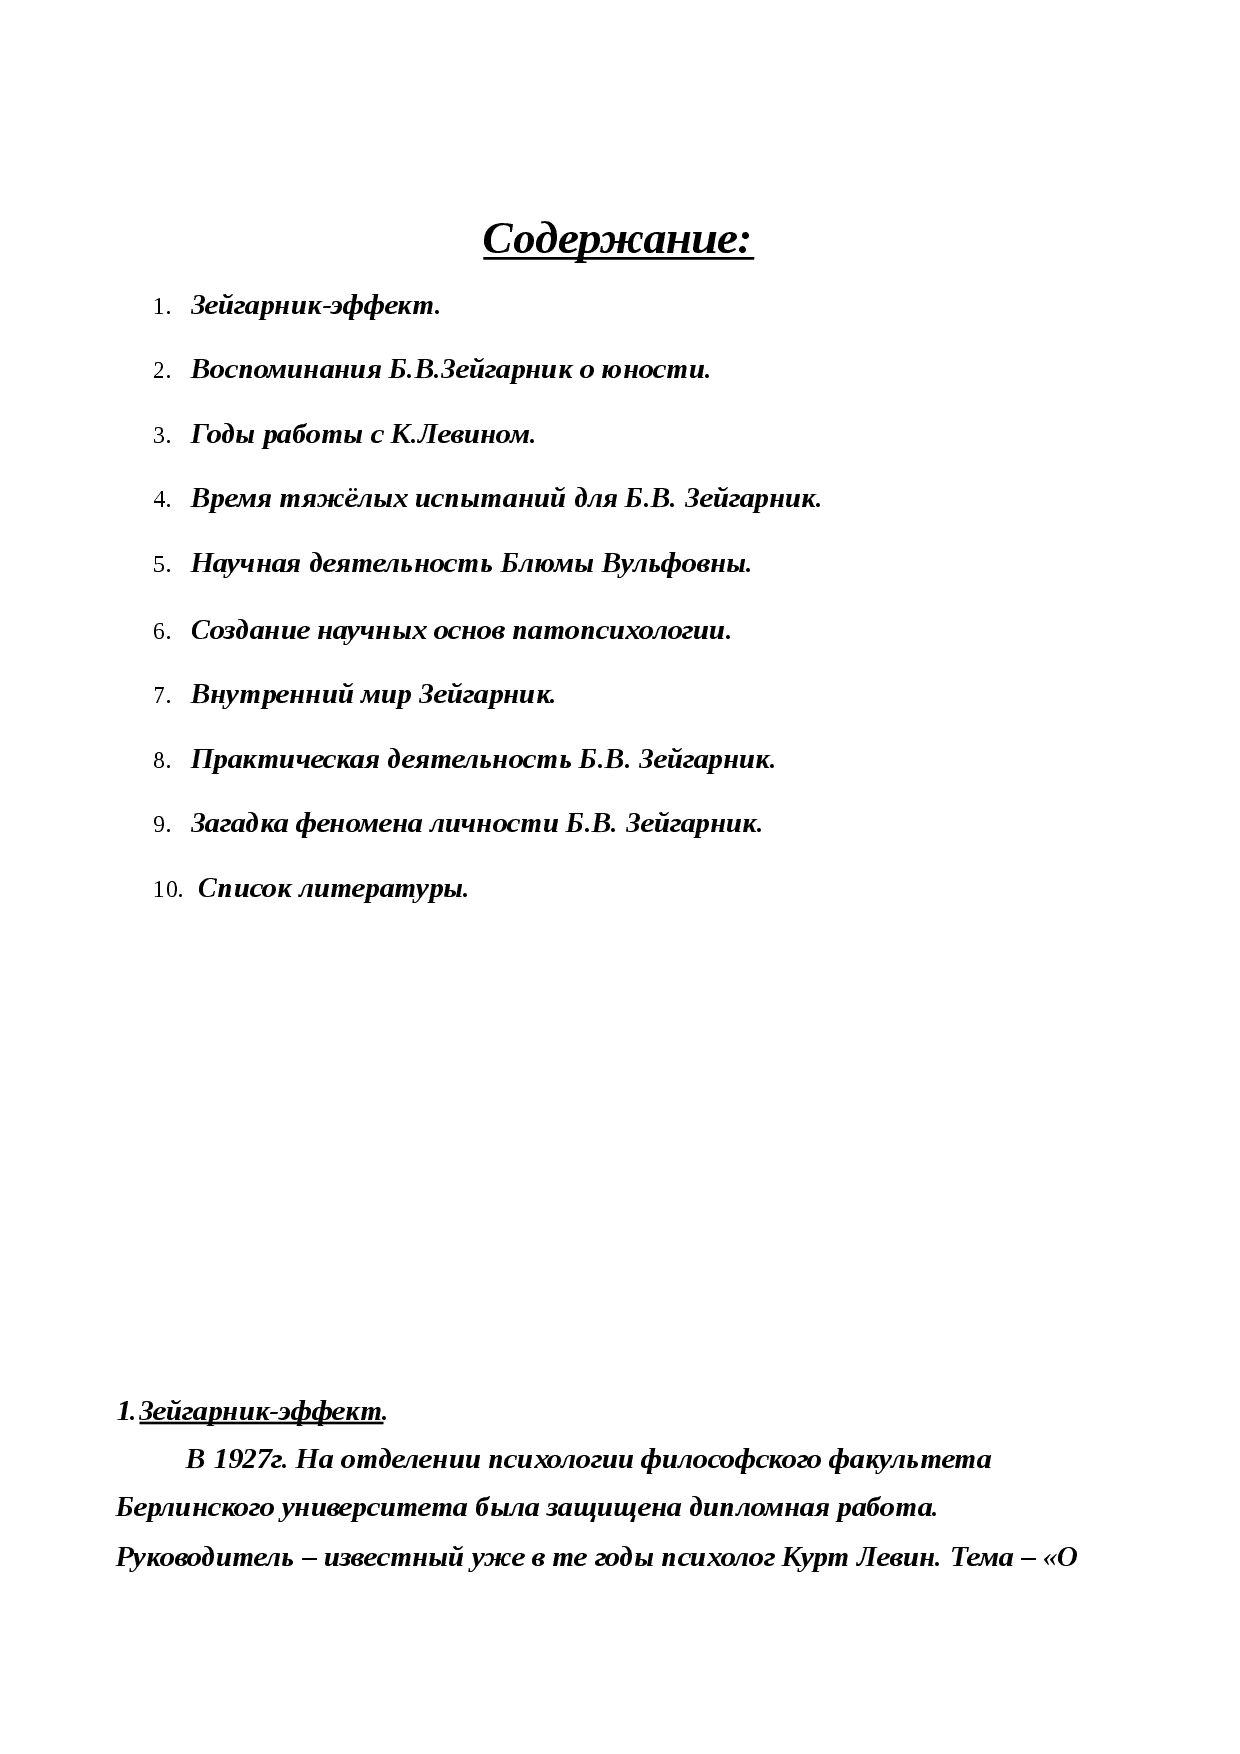 Эффект зейгарник - zeigarnik effect - qwe.wiki